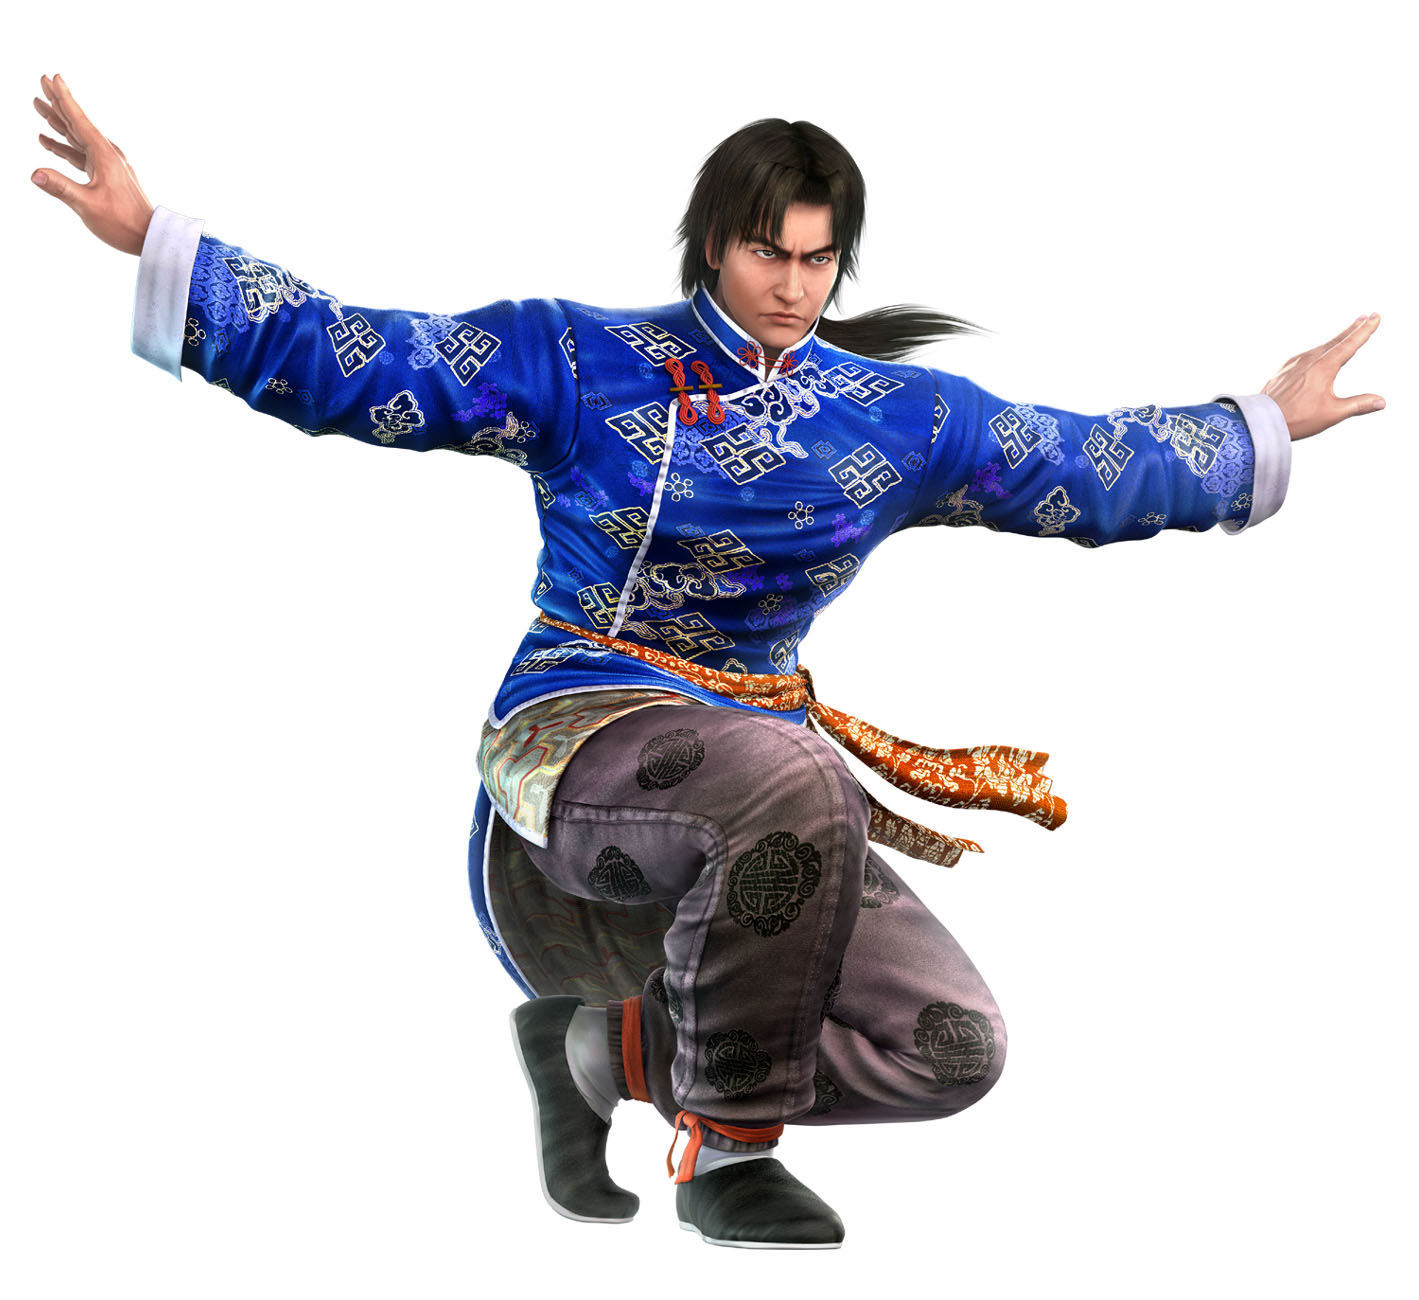 Viralízalo / ¿Qué personaje de Tekken eres?